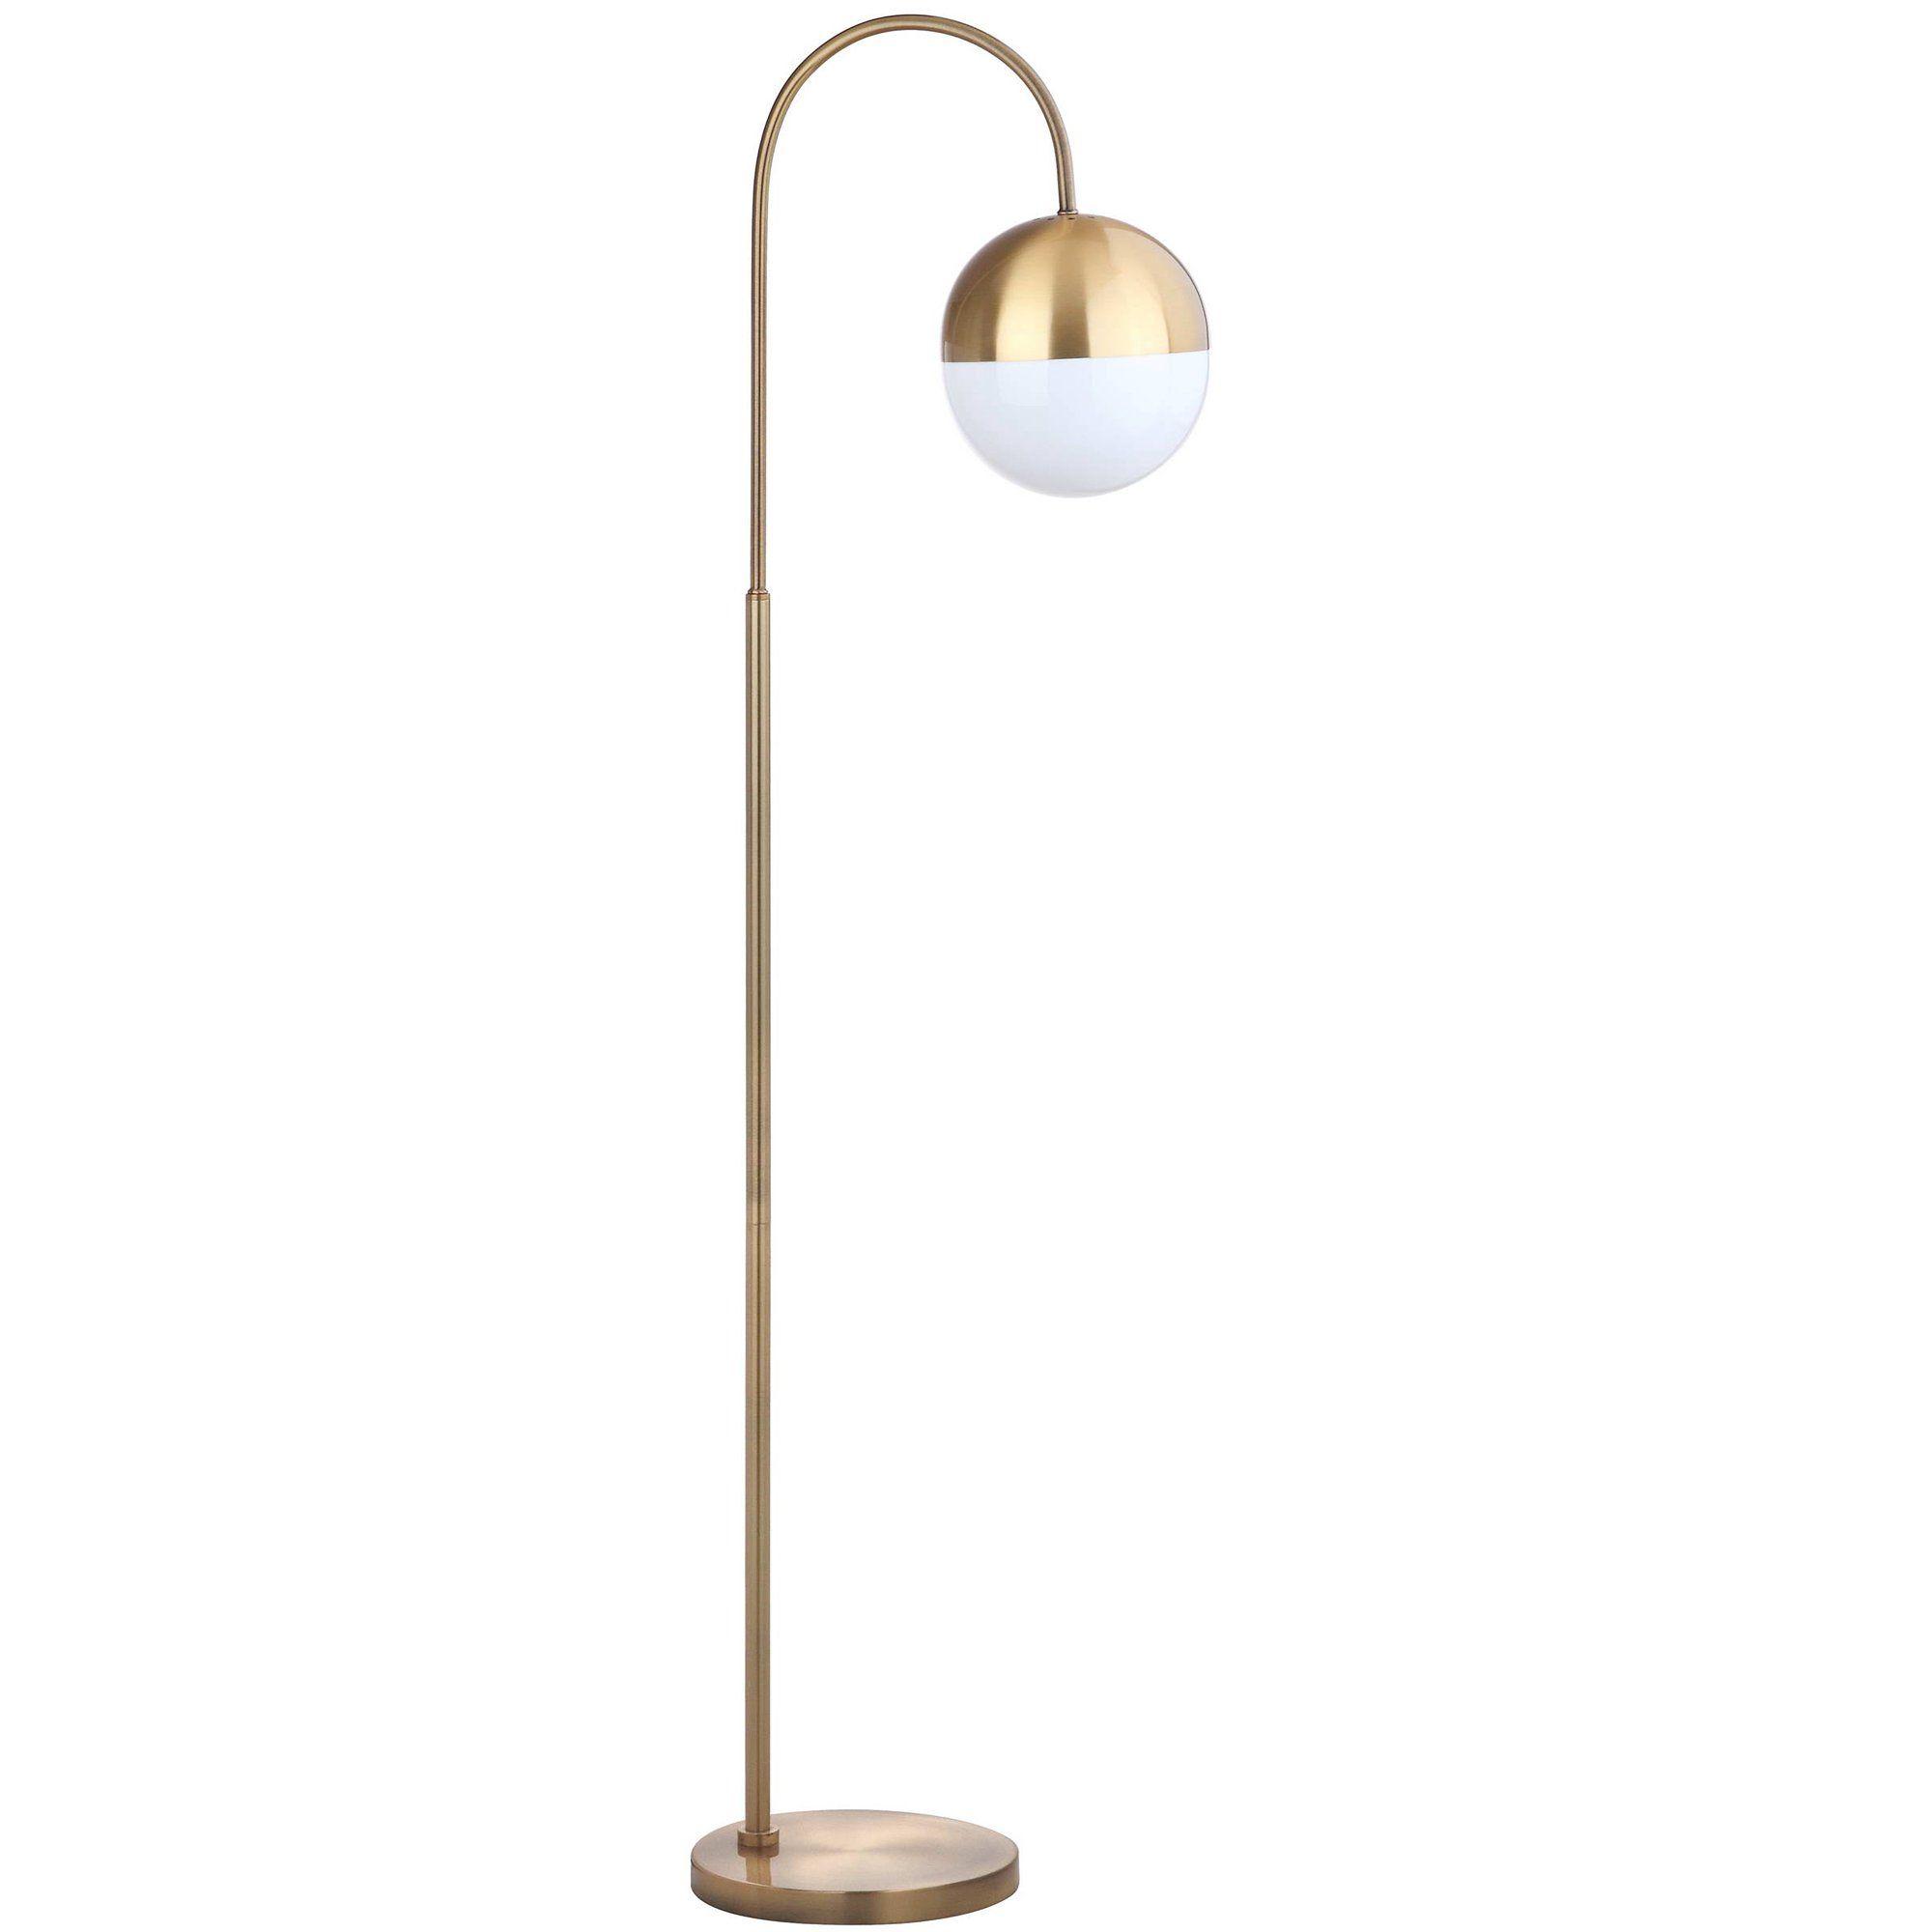 Safavieh Jonas 55 5 In H Modern Glam Curved Floor Lamp Brass Gold Walmart Com In 2020 Gold Floor Lamp Arched Floor Lamp Curved Floor Lamp